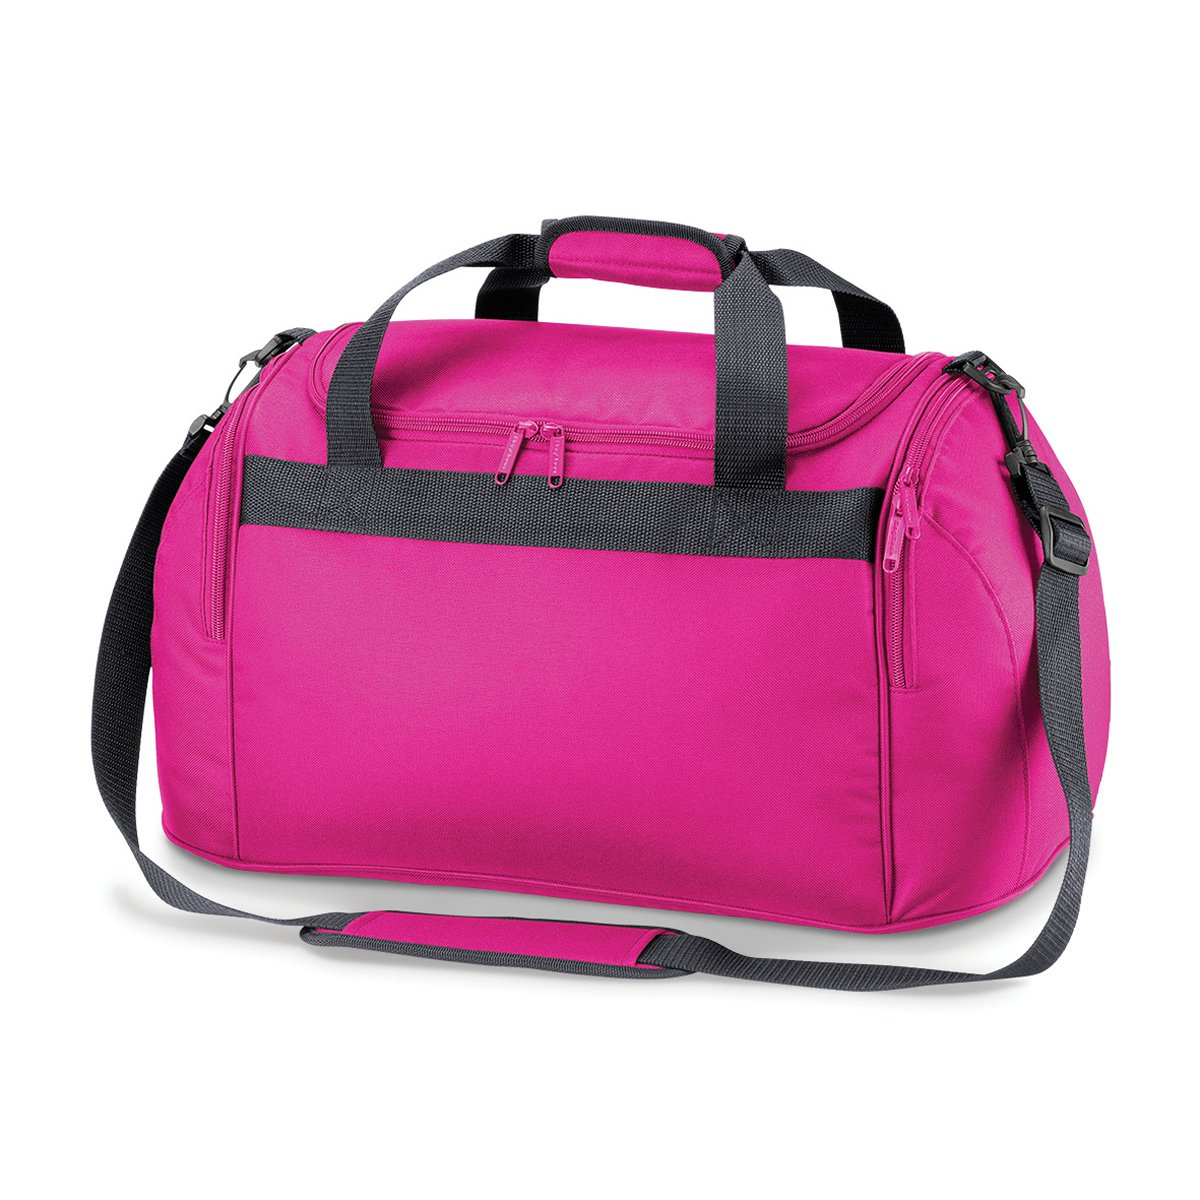 BagBase Travel Bag Adjustable Shoulder Pad Freestyle holdall 54x28x25cm 26L Tote